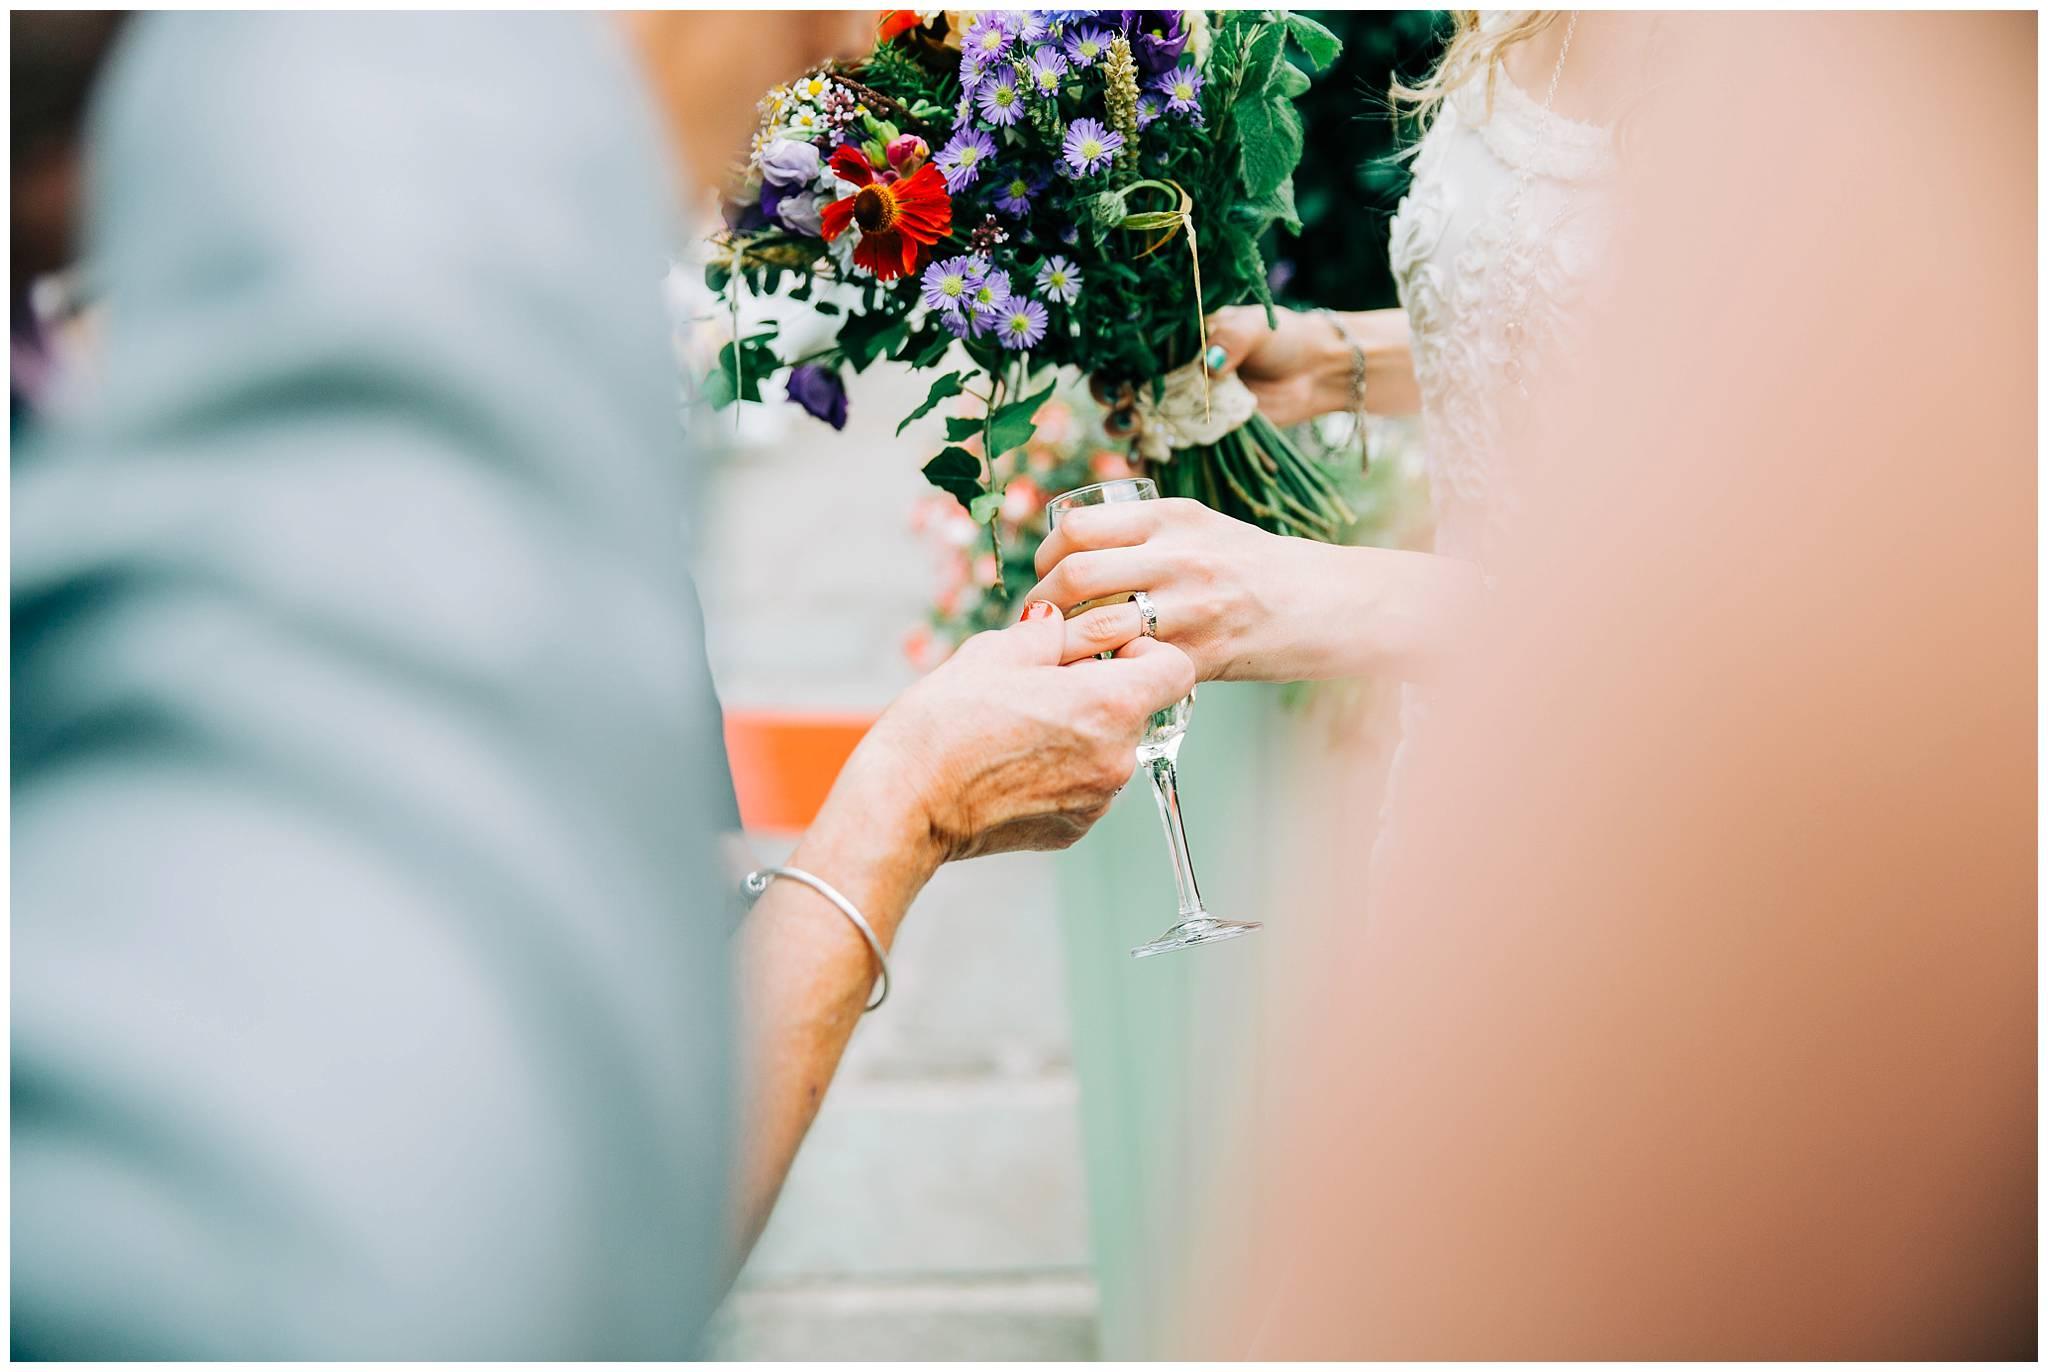 guest is looking at brides vintage wedding ring